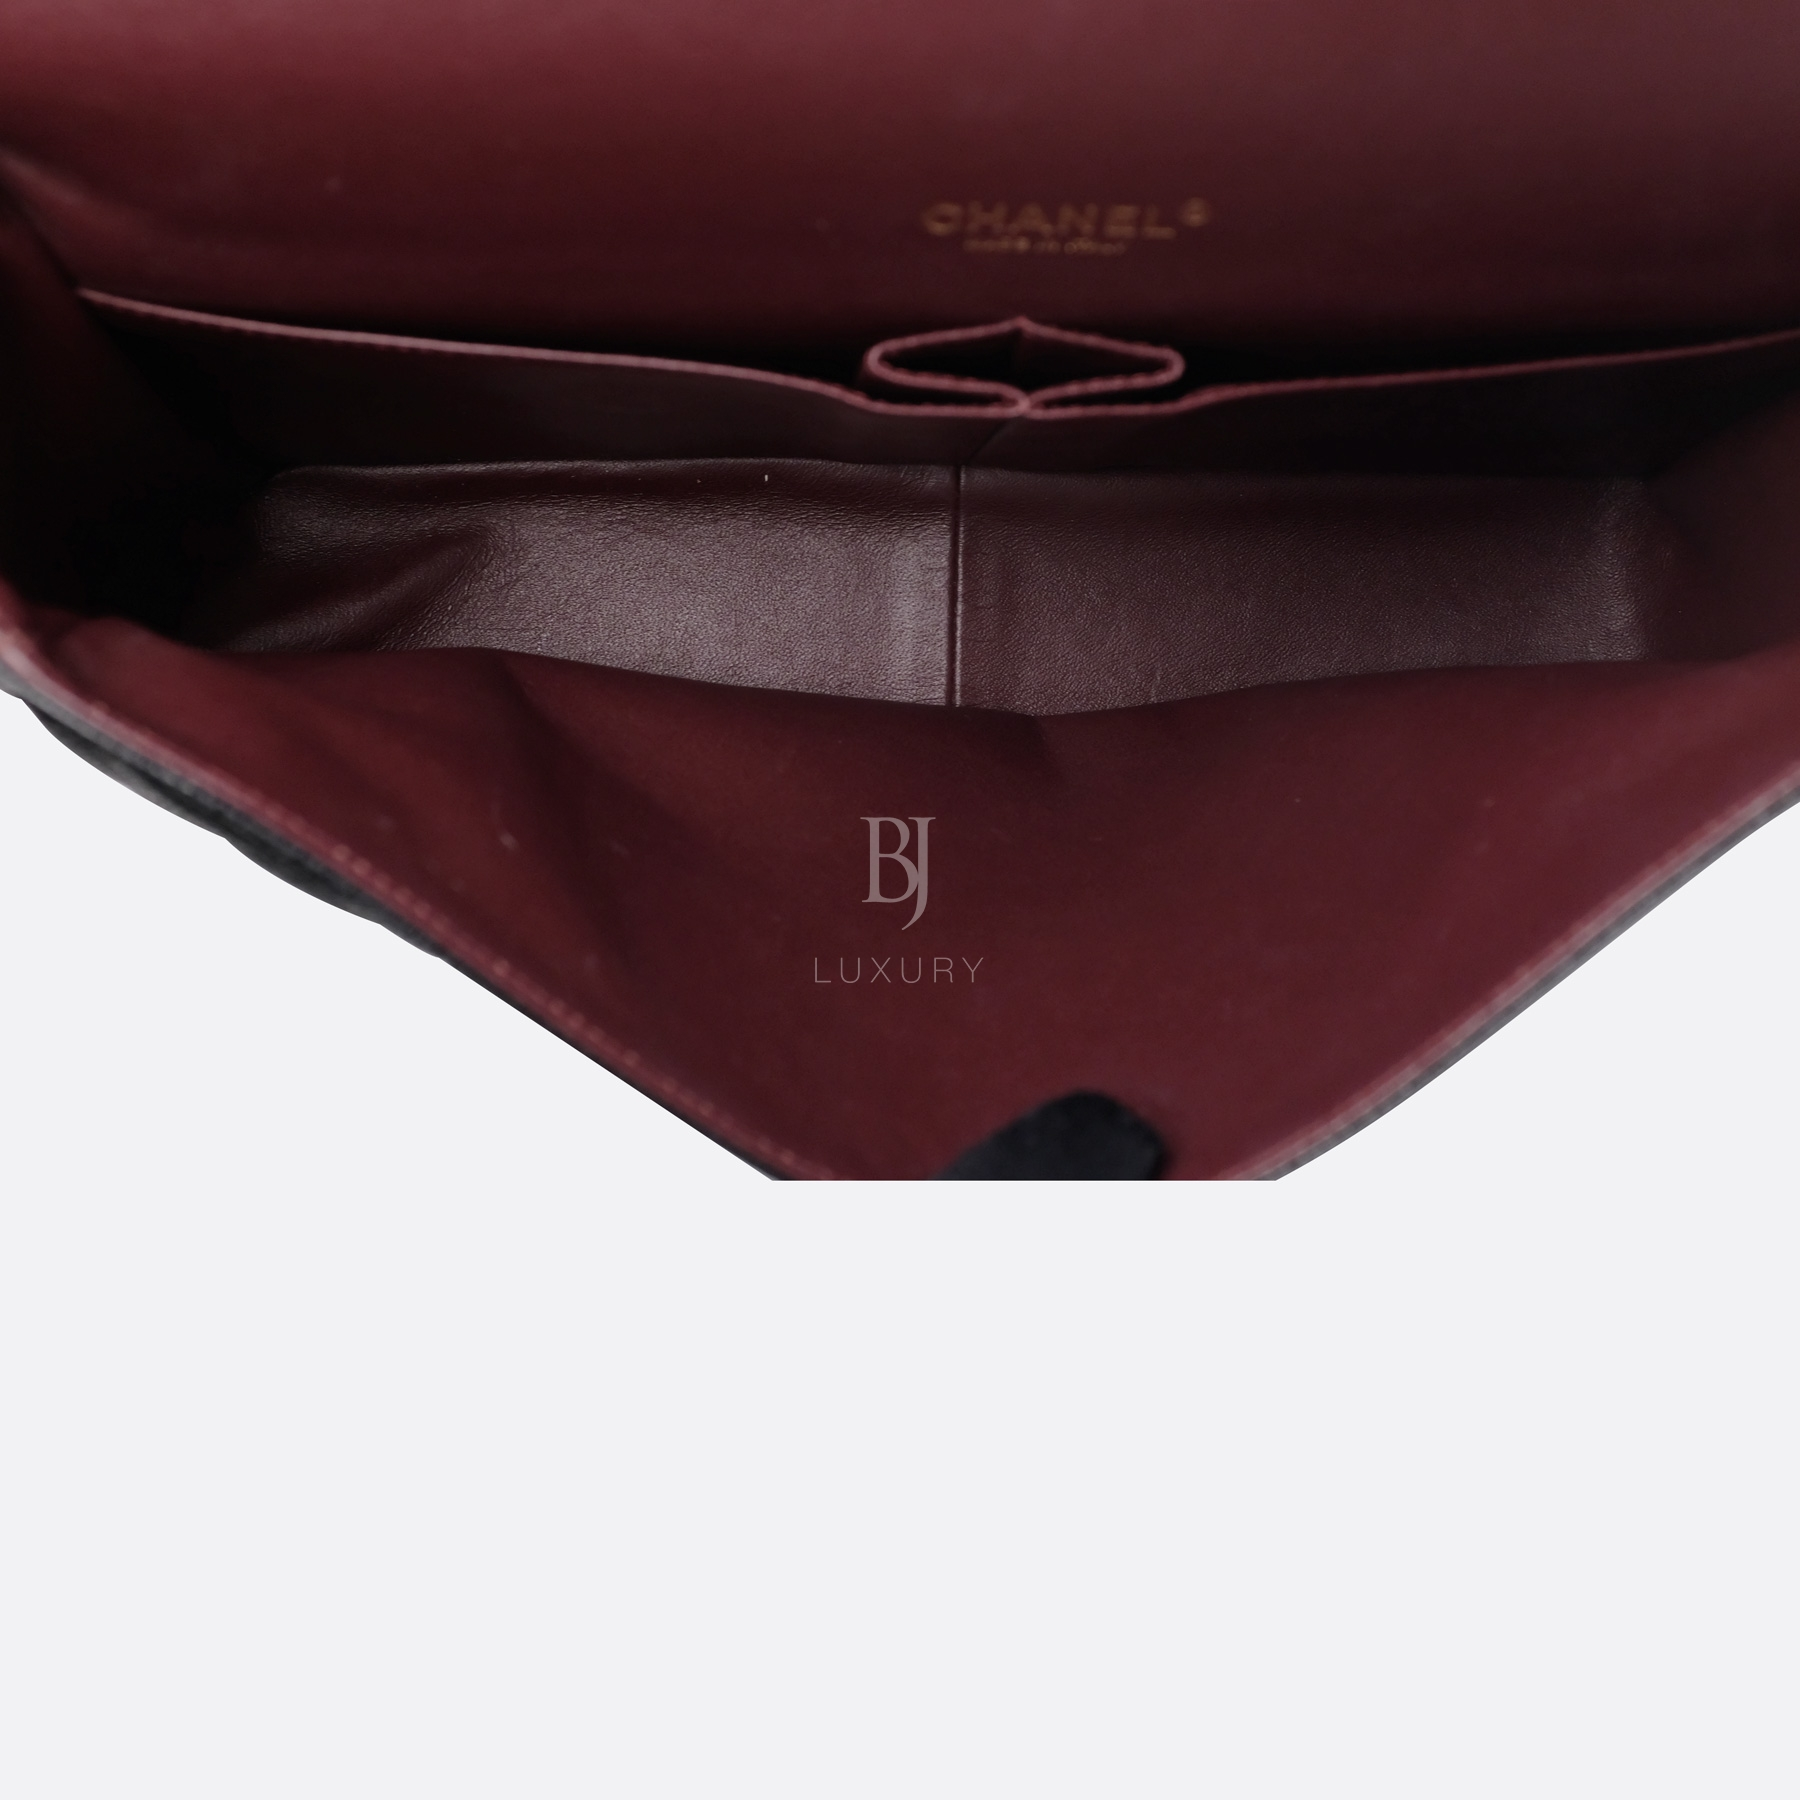 Chanel Classic Handbag Caviar Maxi Black BJ Luxury 20.jpg